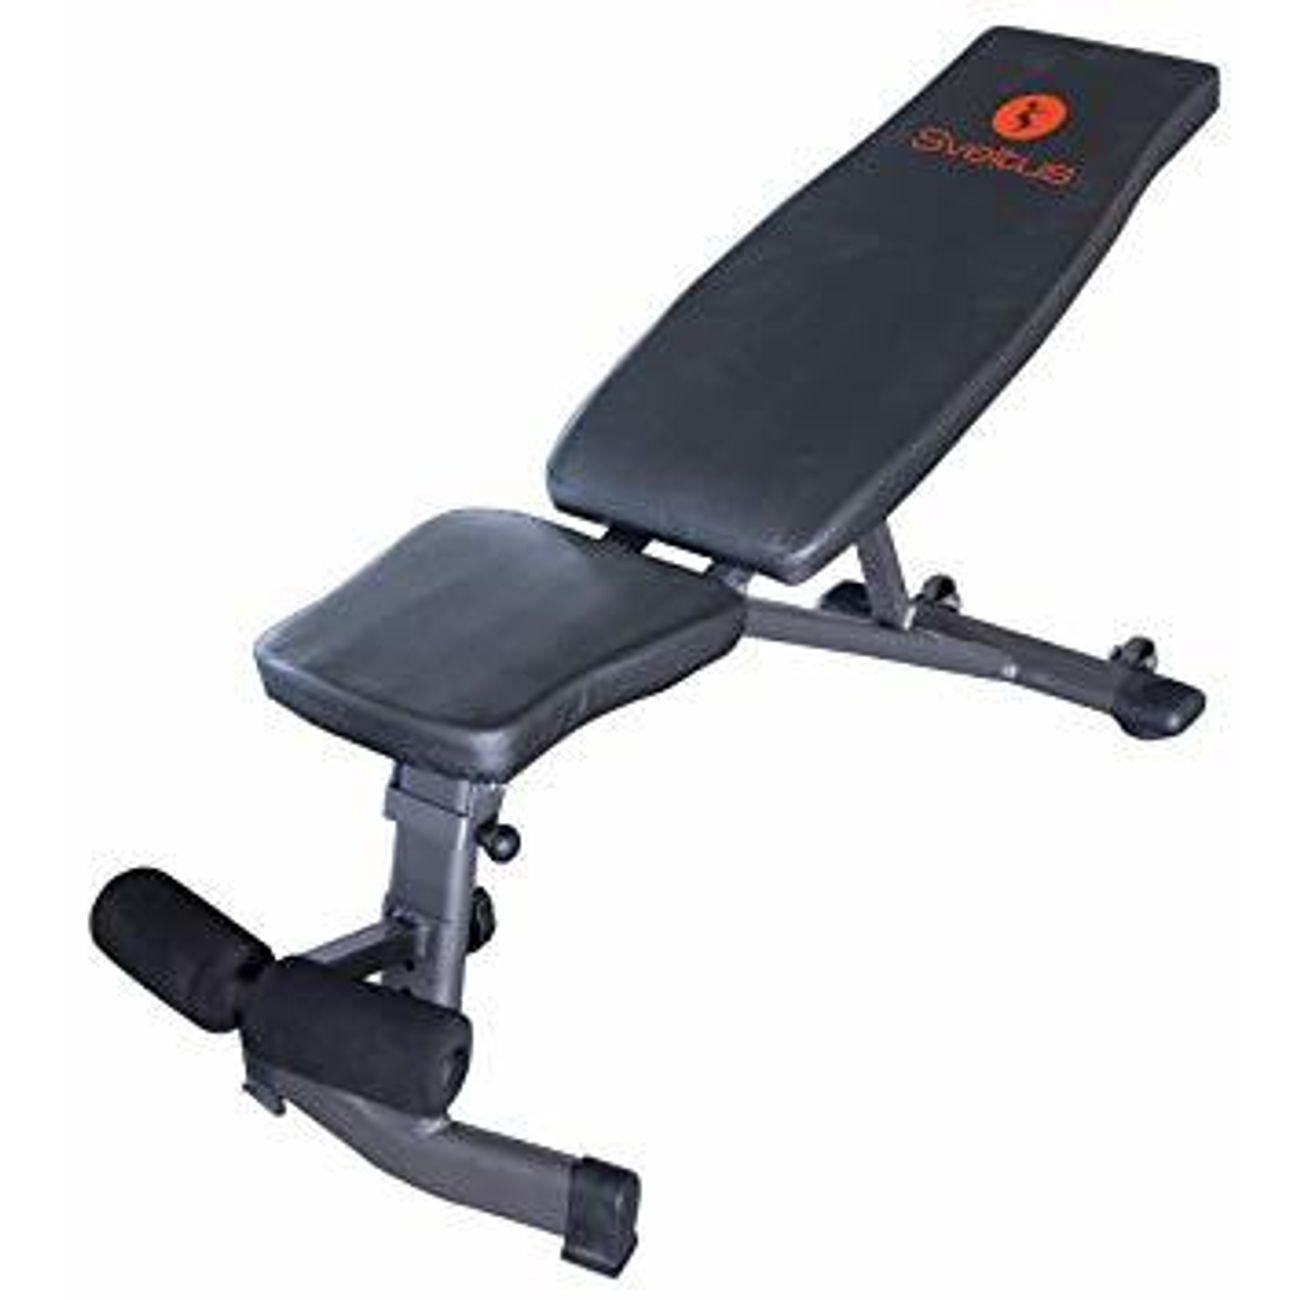 Adulte Sveltus Musculation Banc Fitness De ARLq5c34jS